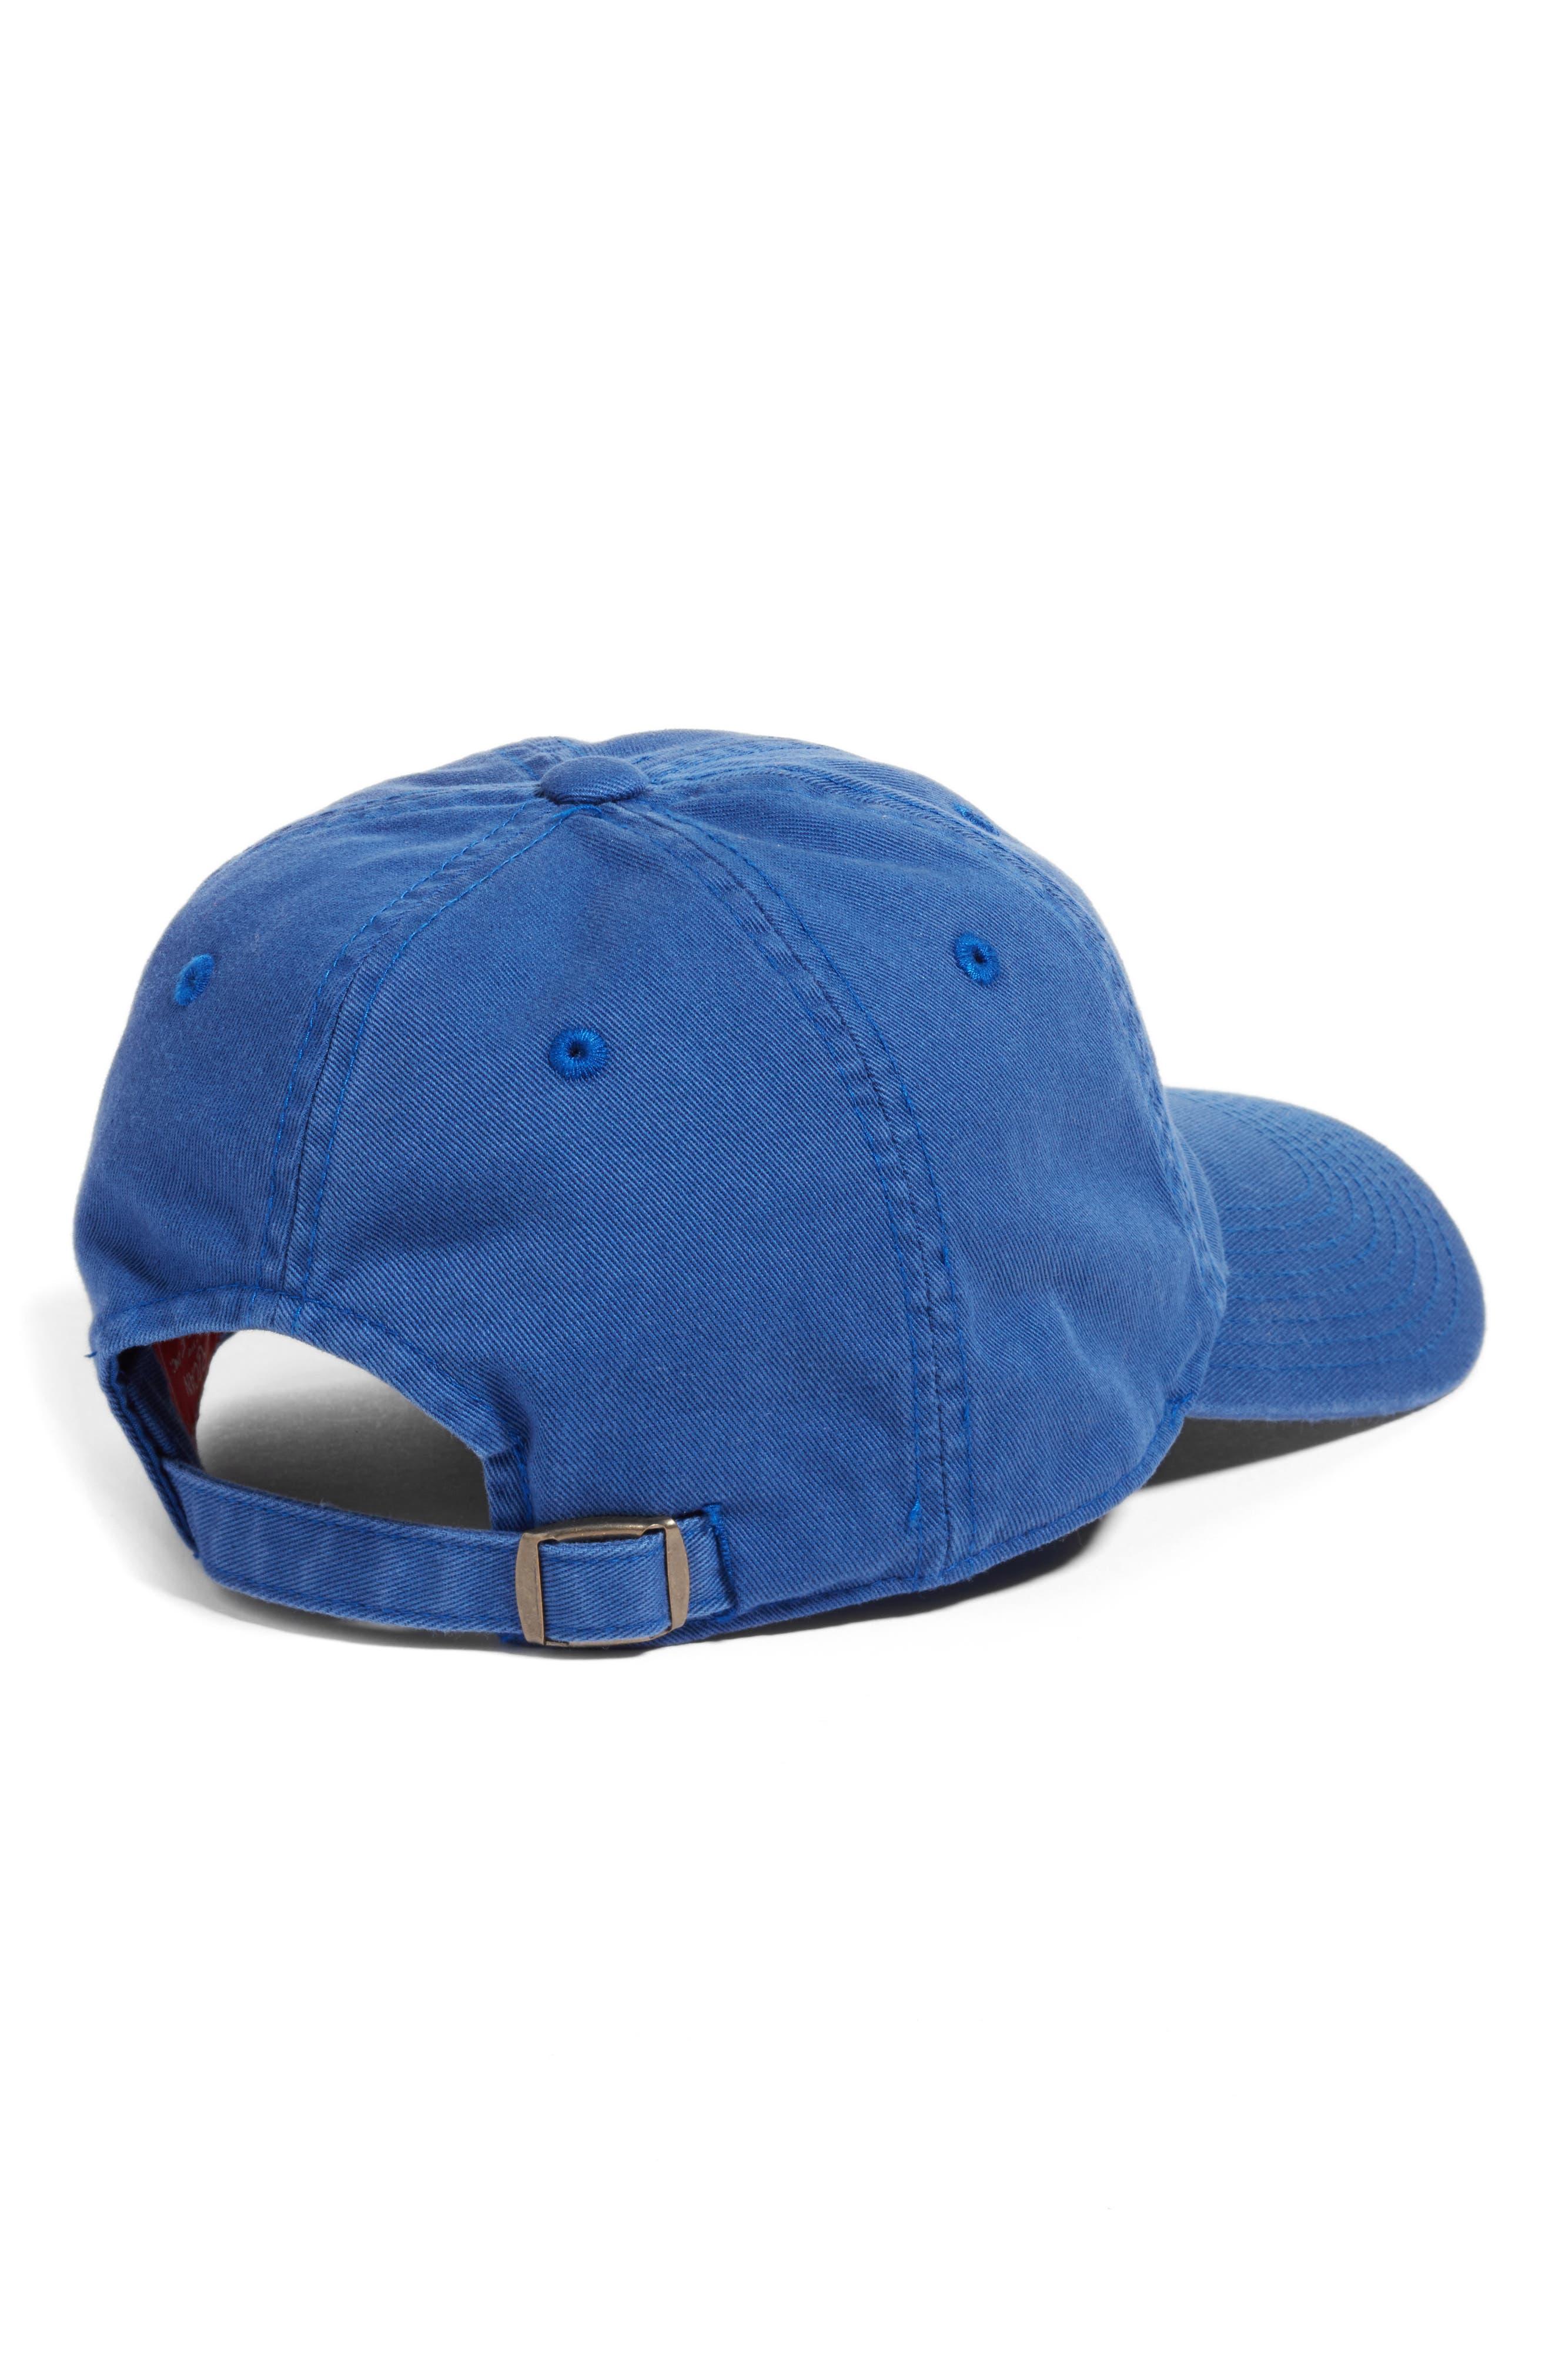 Boardshort - Chicago Baseball Cap,                             Alternate thumbnail 2, color,                             BAY BLUE